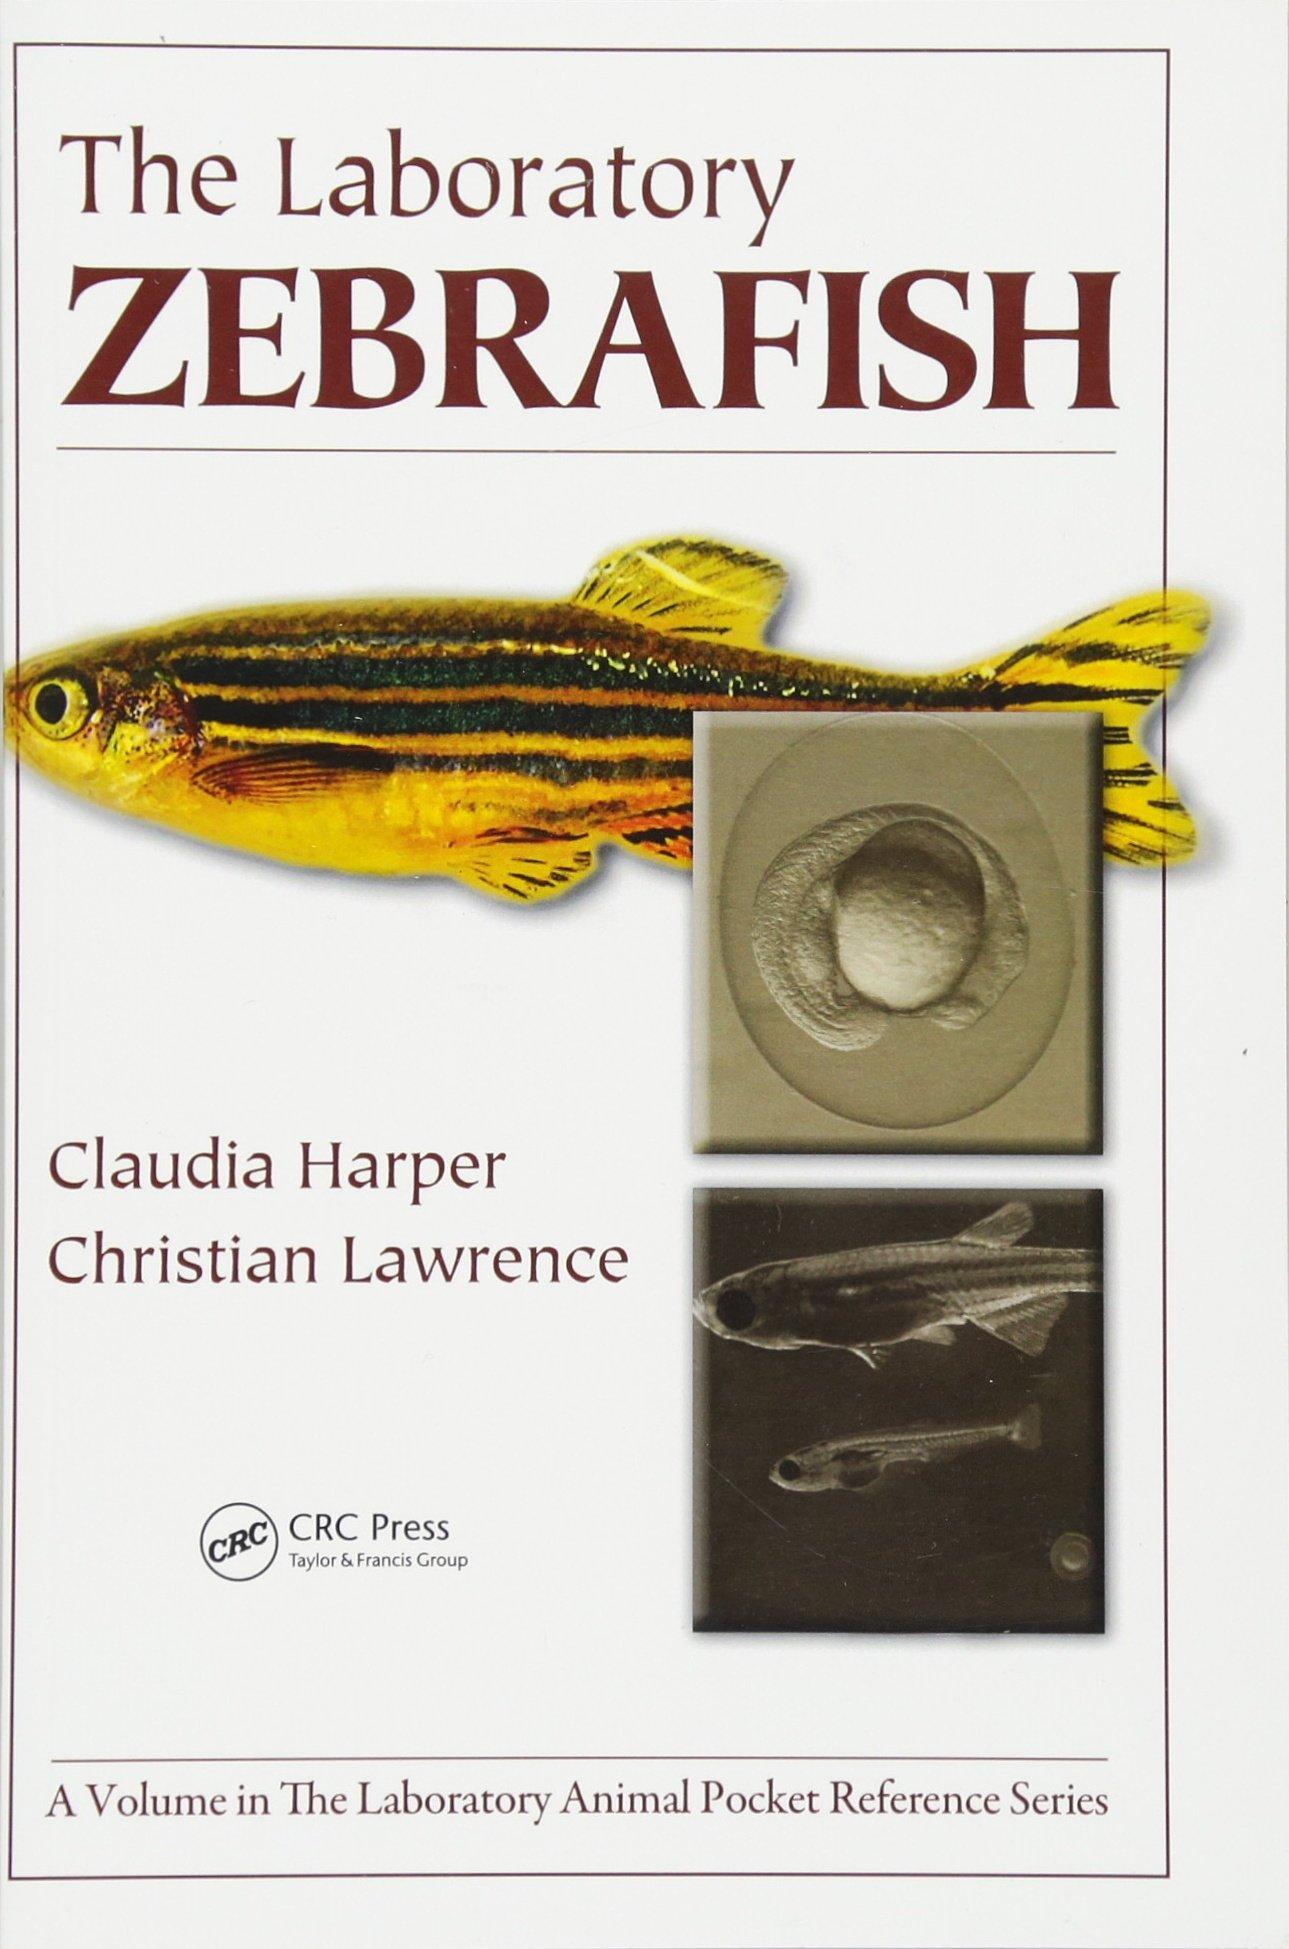 The Laboratory Zebrafish (Laboratory Animal Pocket Reference) (Volume 16) by CRC Press (Image #1)